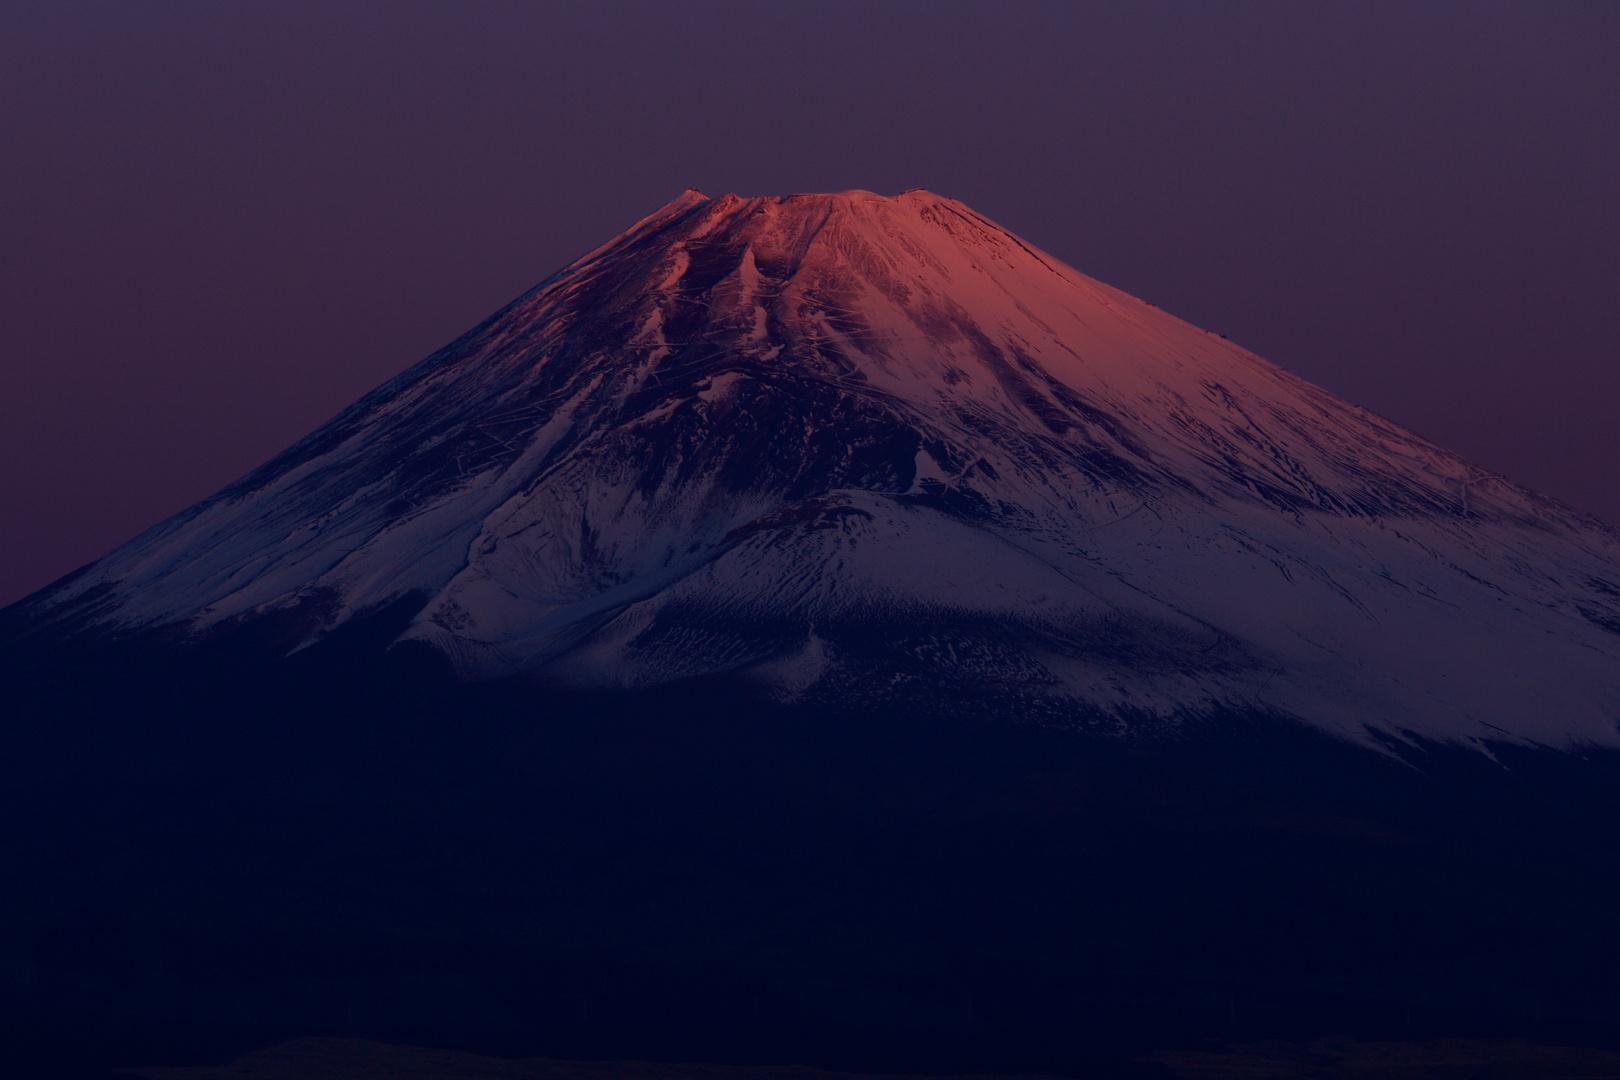 Beni Fuji